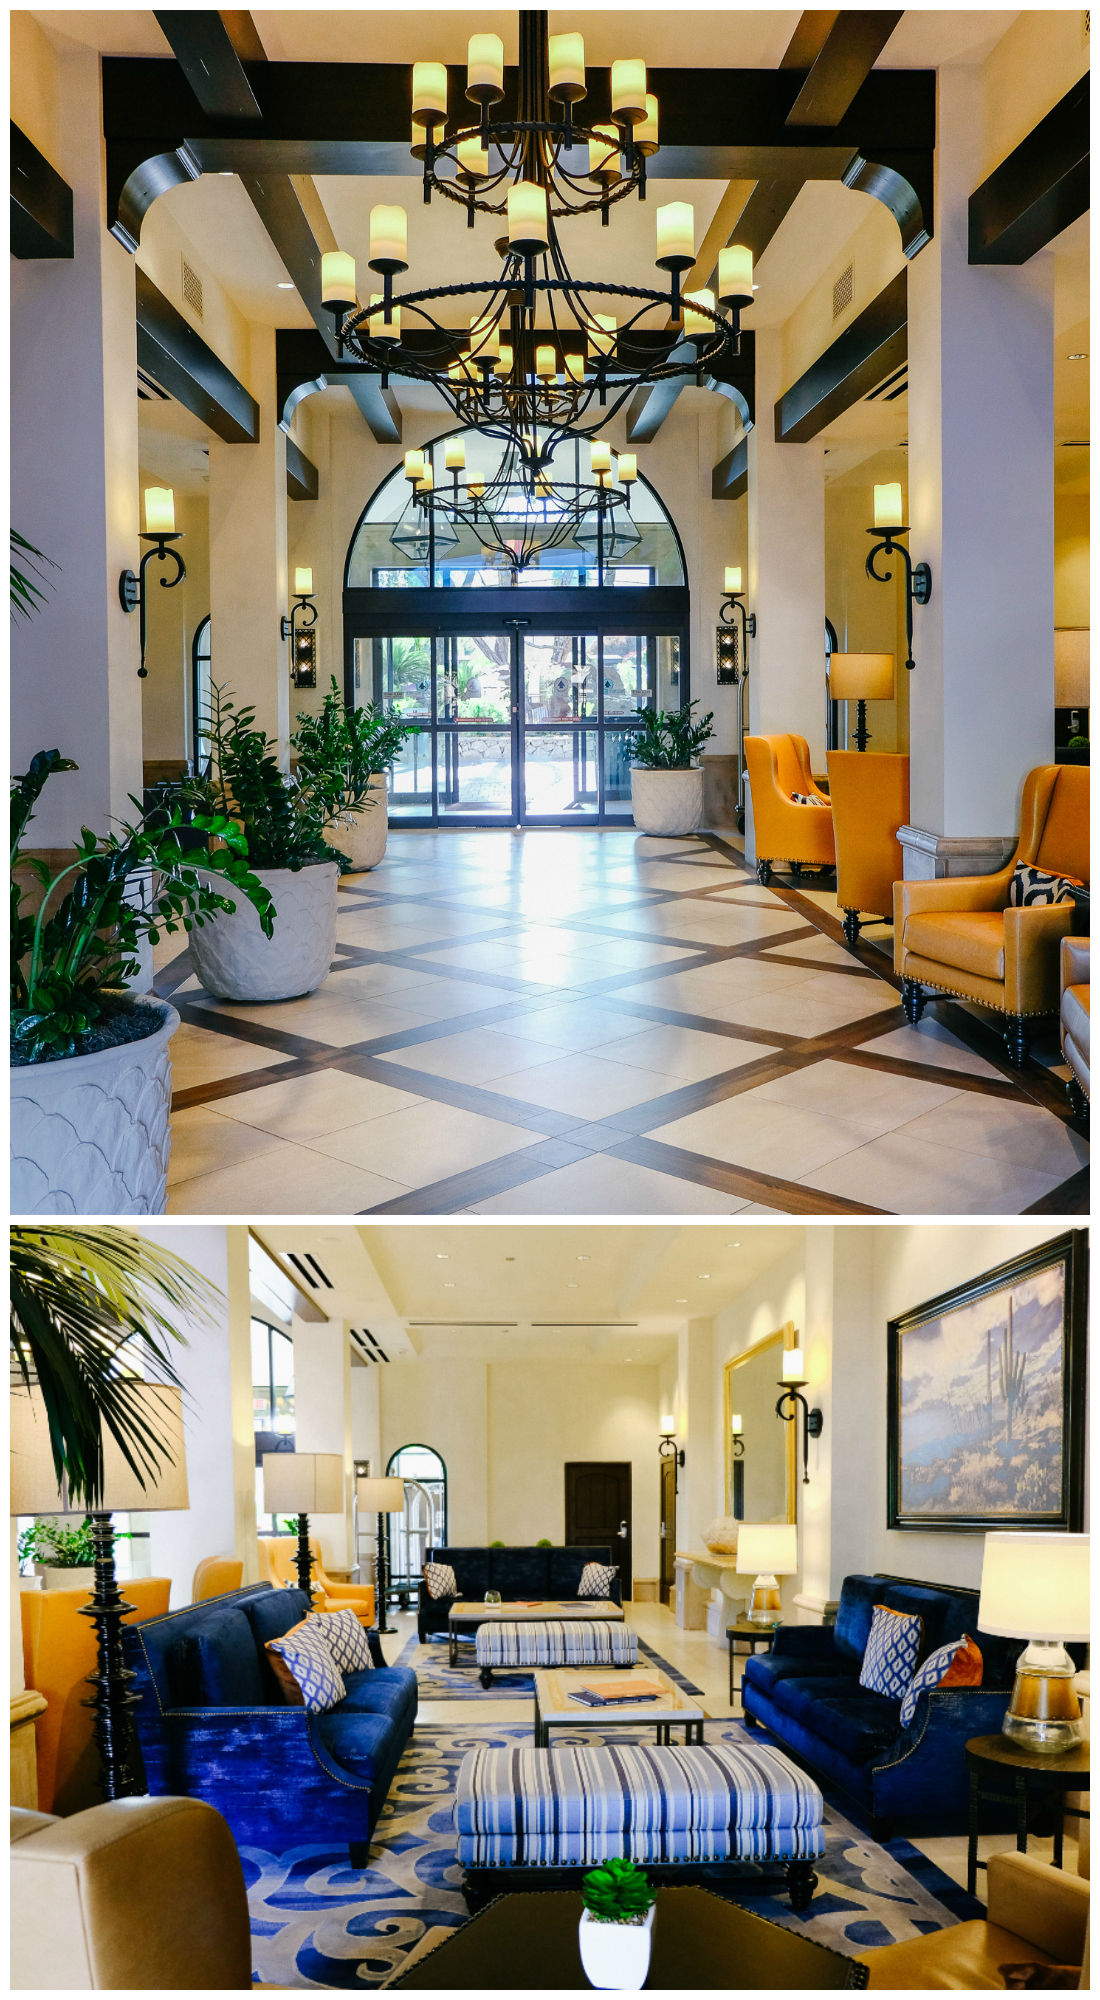 Where to Stay in Scottsdale Arizona